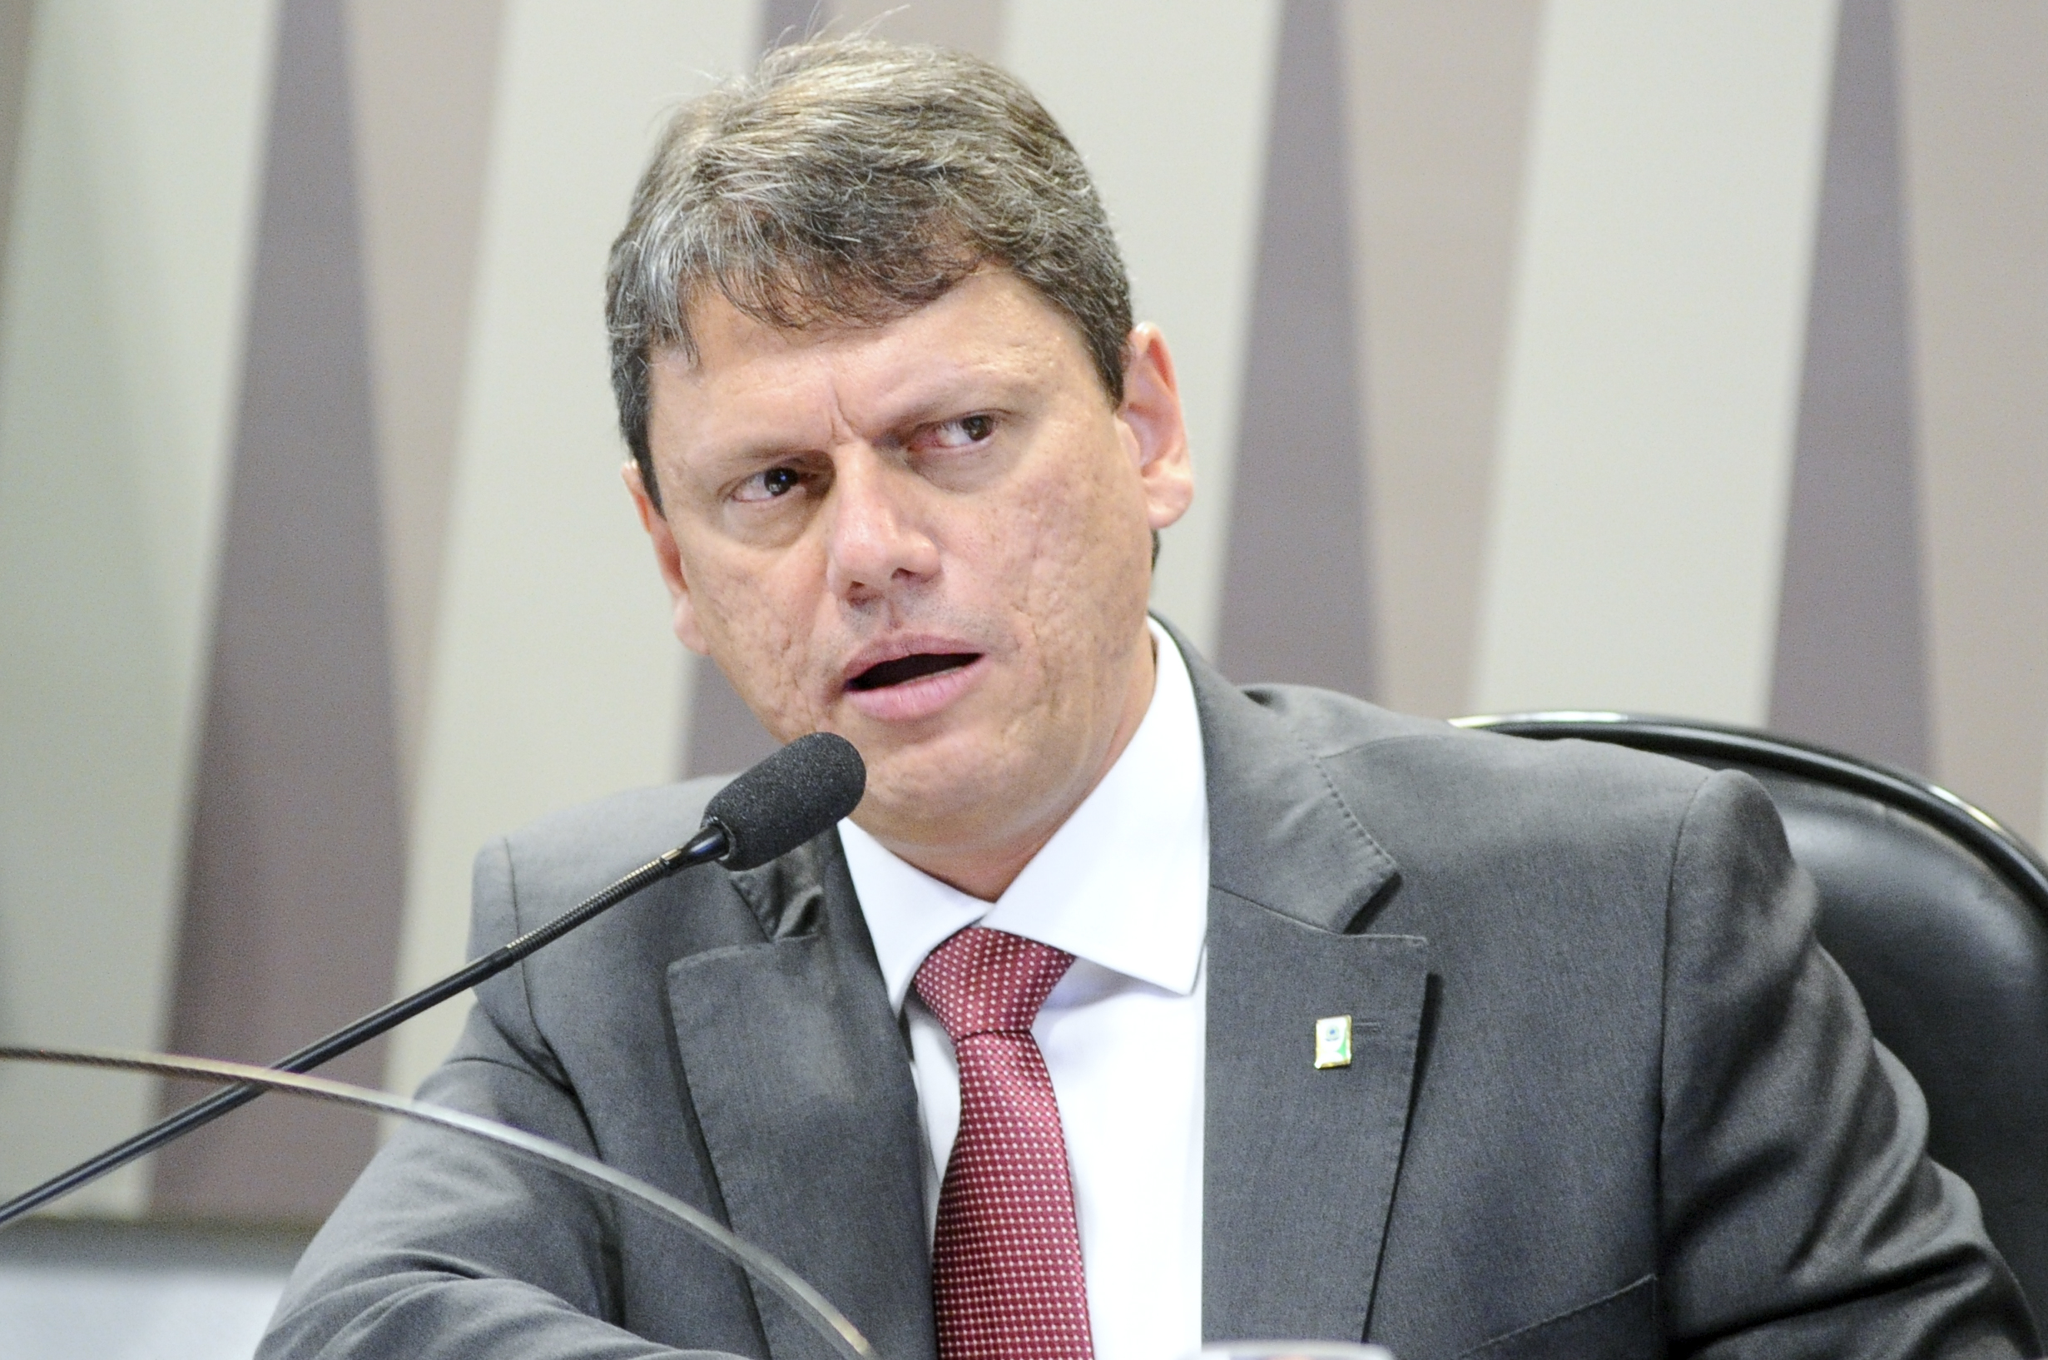 Tarcísio de Freitas